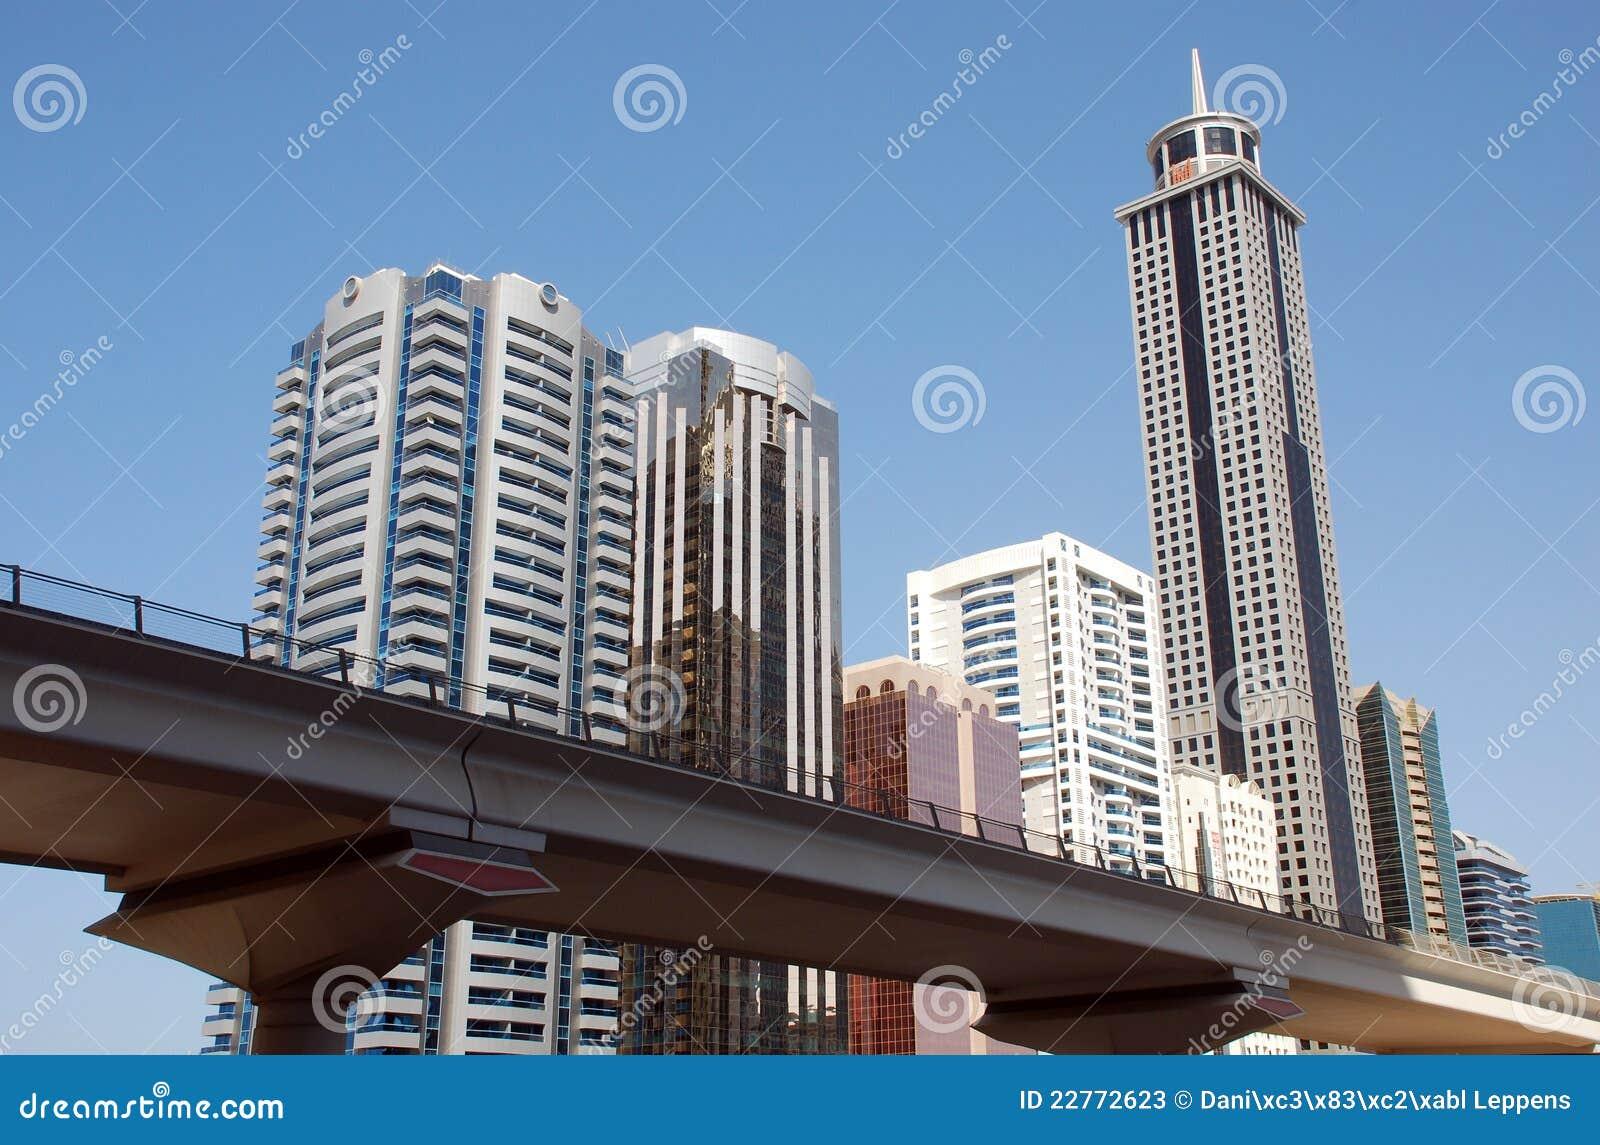 Modern architecture stock photos image 22772623 for Dubai architecture moderne